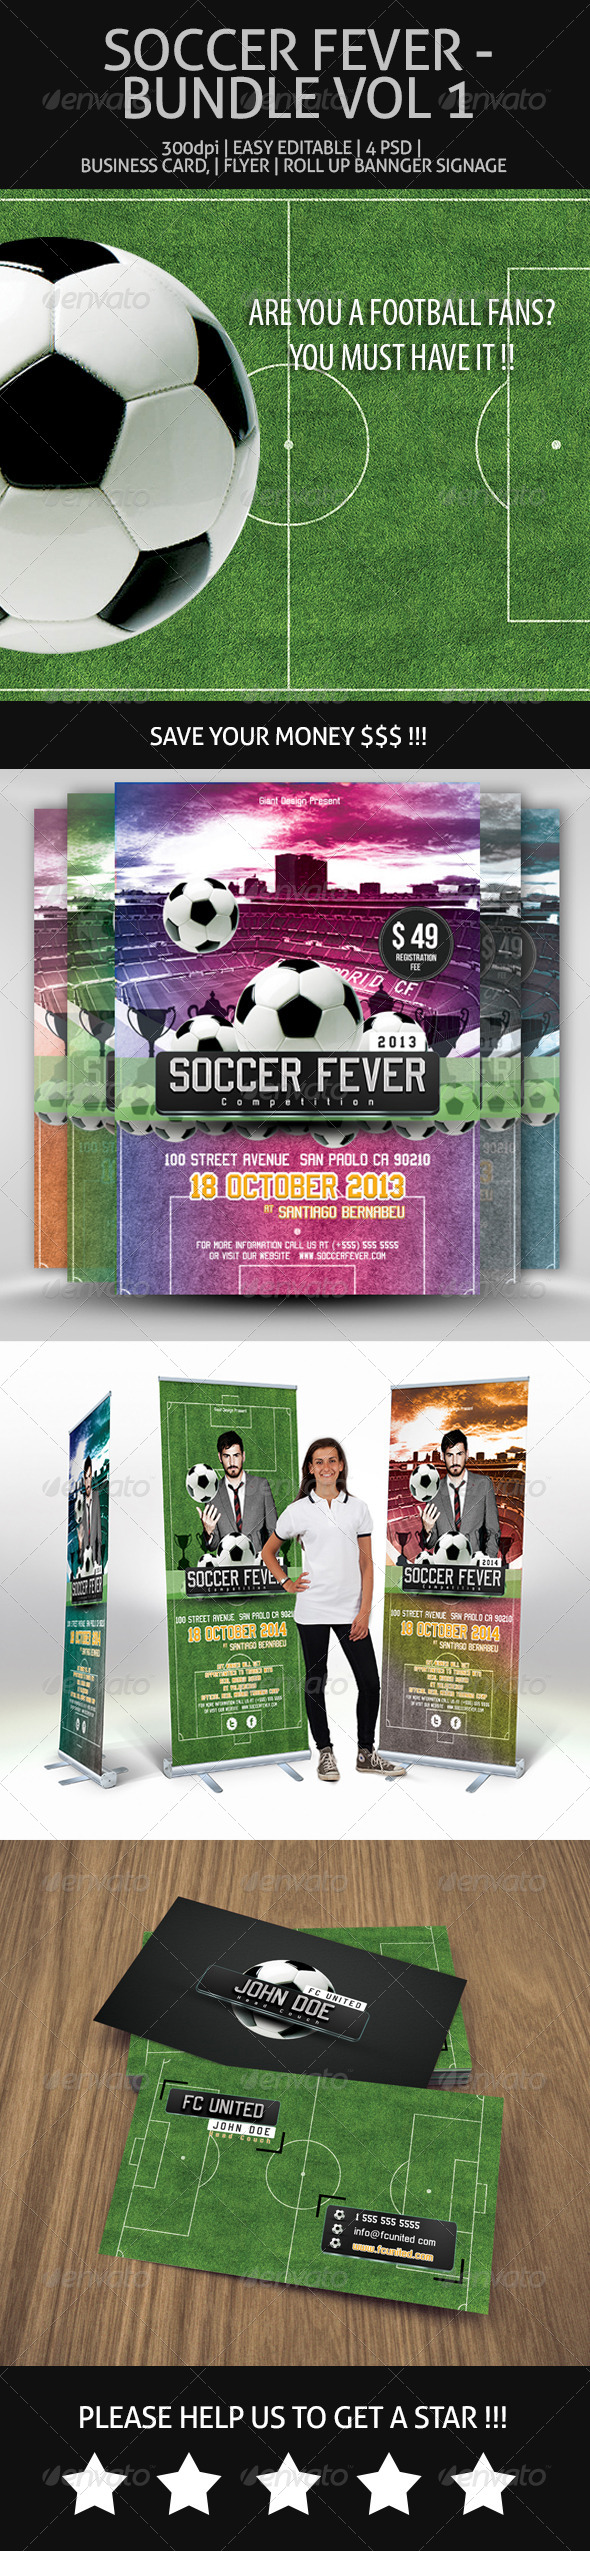 GraphicRiver Soccer Fever Bundle Vol 1 7191773